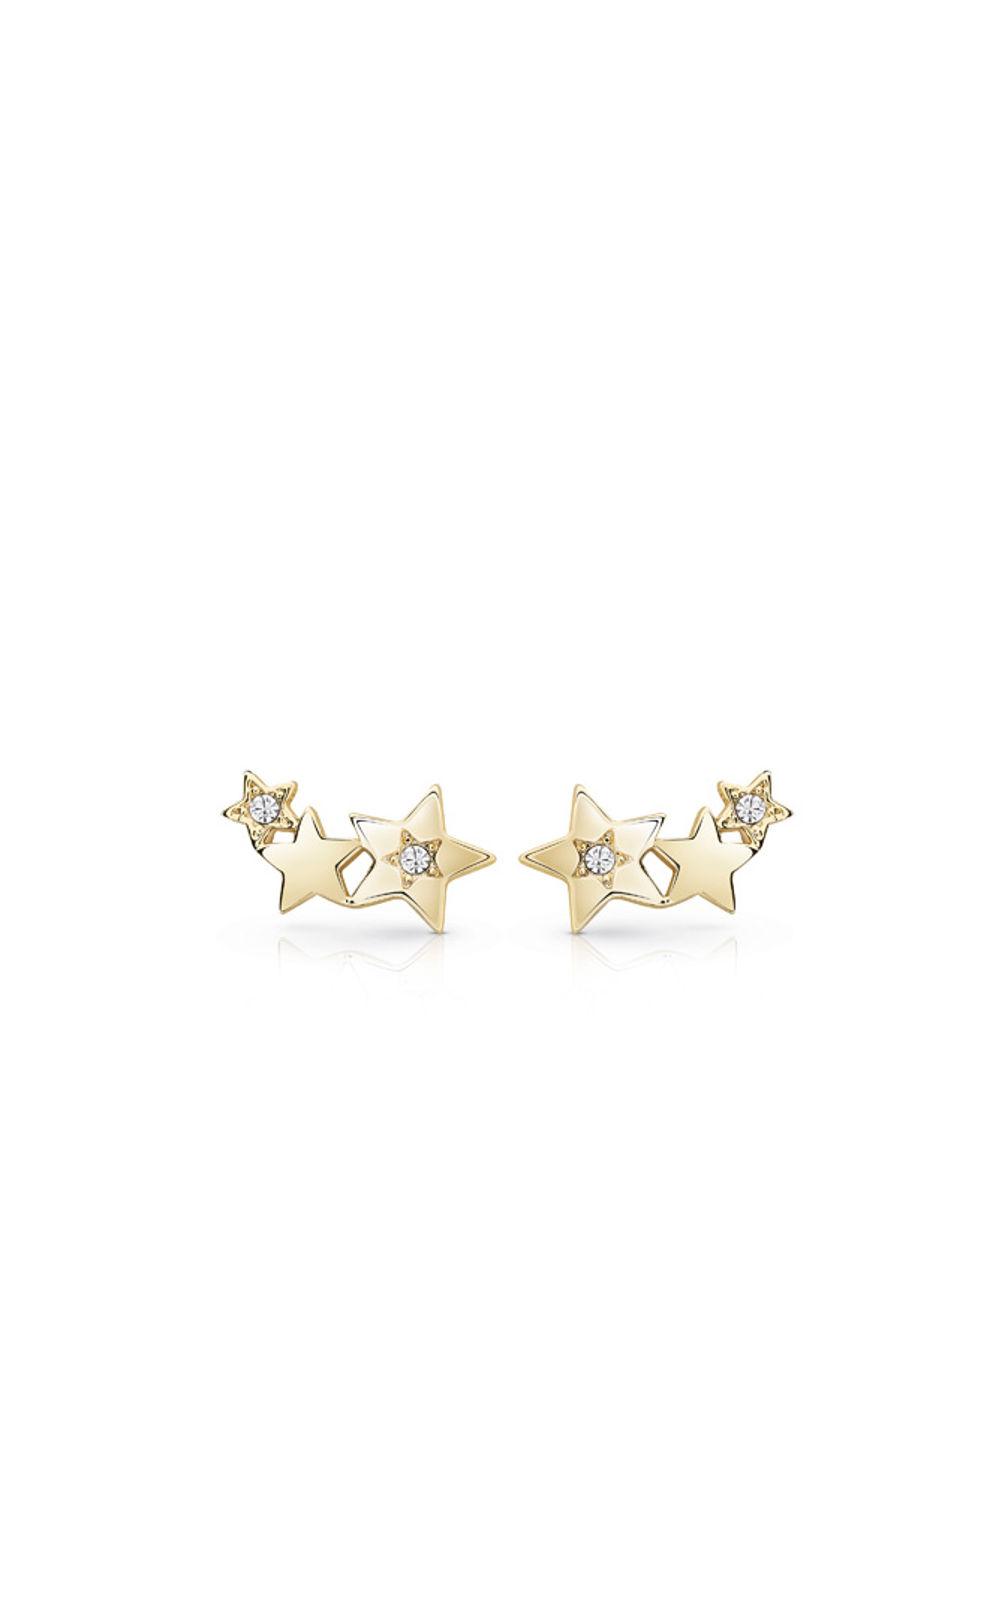 GUESS FAUX UBE84014 Χρυσά Σκουλαρίκια Αστέρια